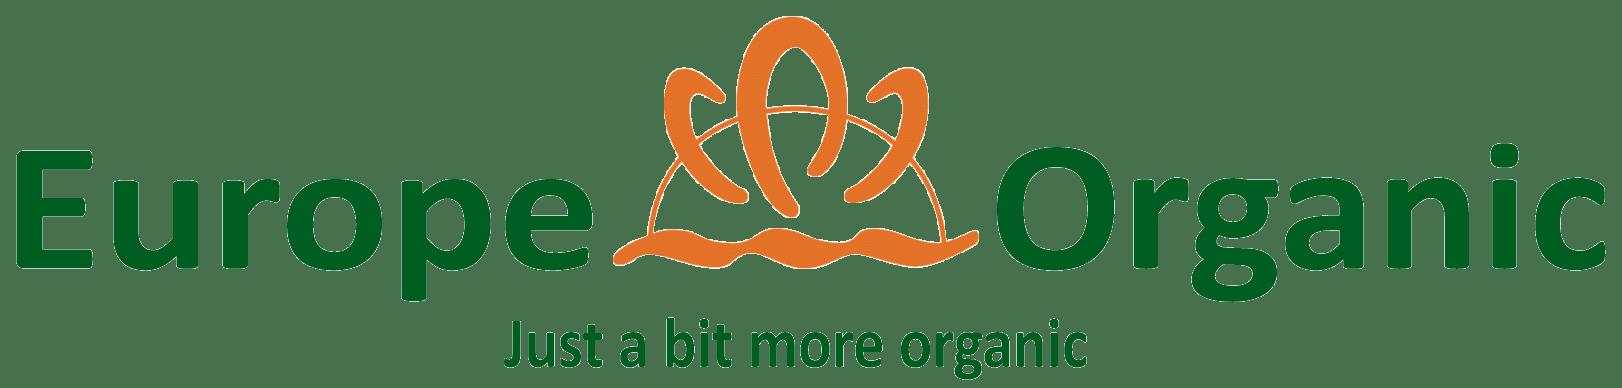 Europe Organic